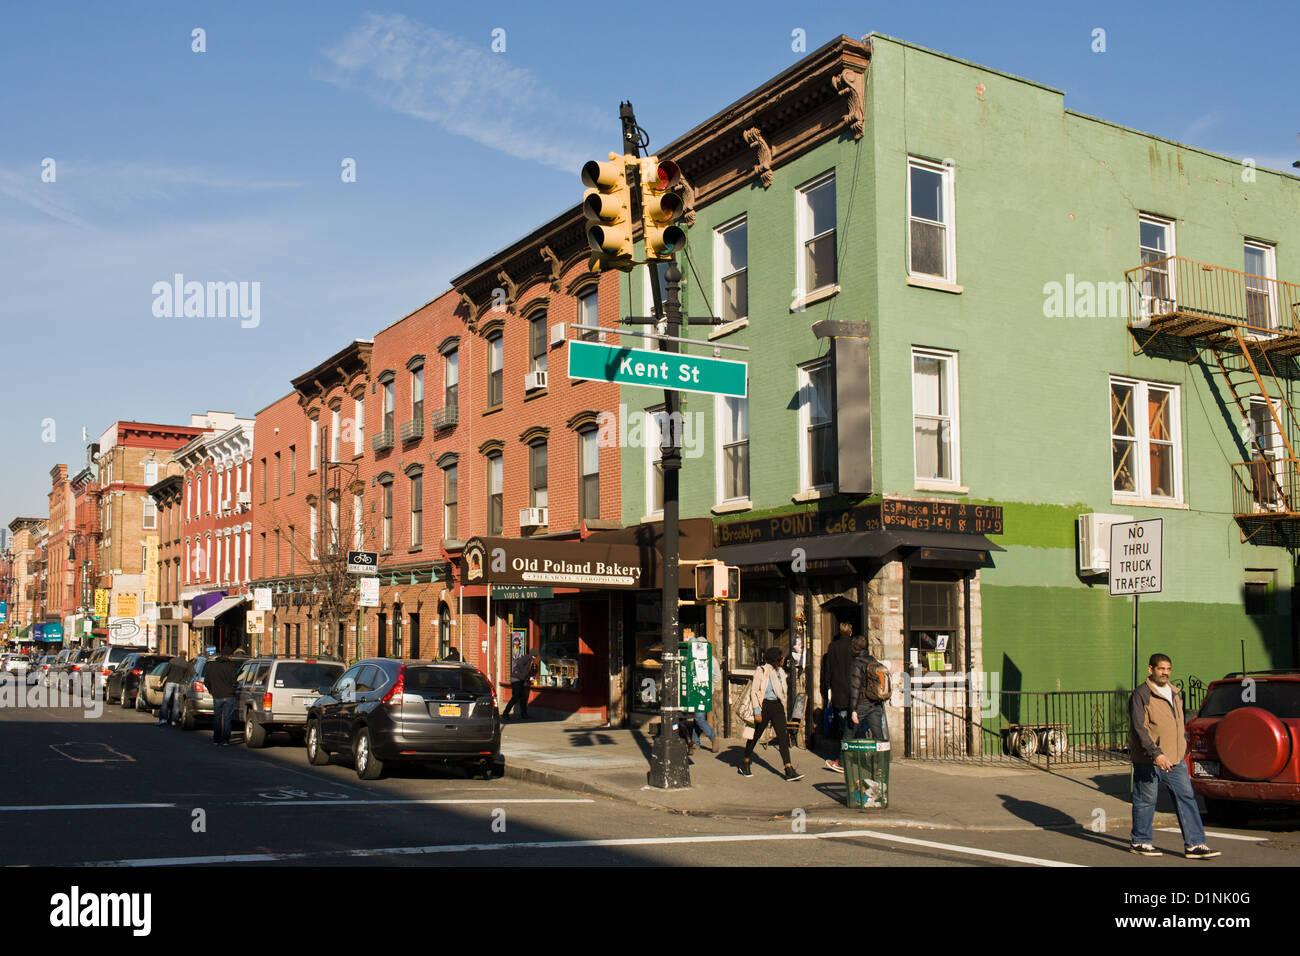 Polish neighborhood of Greenpoint, Brooklyn, New York - Stock Image